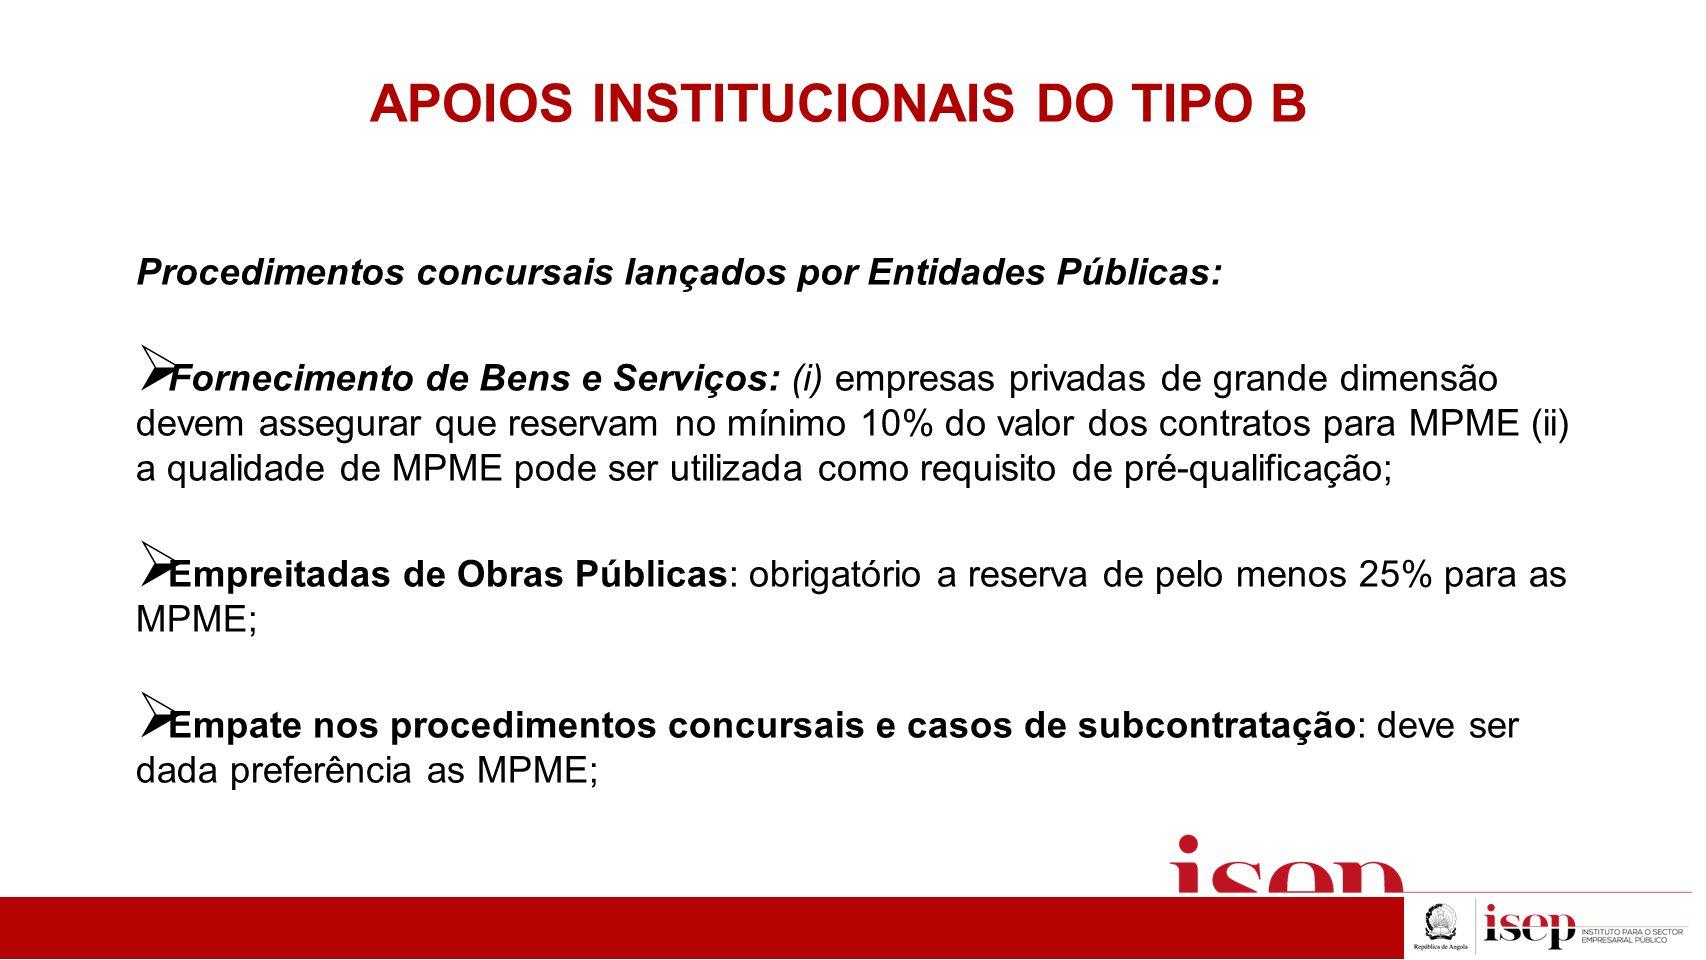 APOIOS INSTITUCIONAIS DO TIPO B